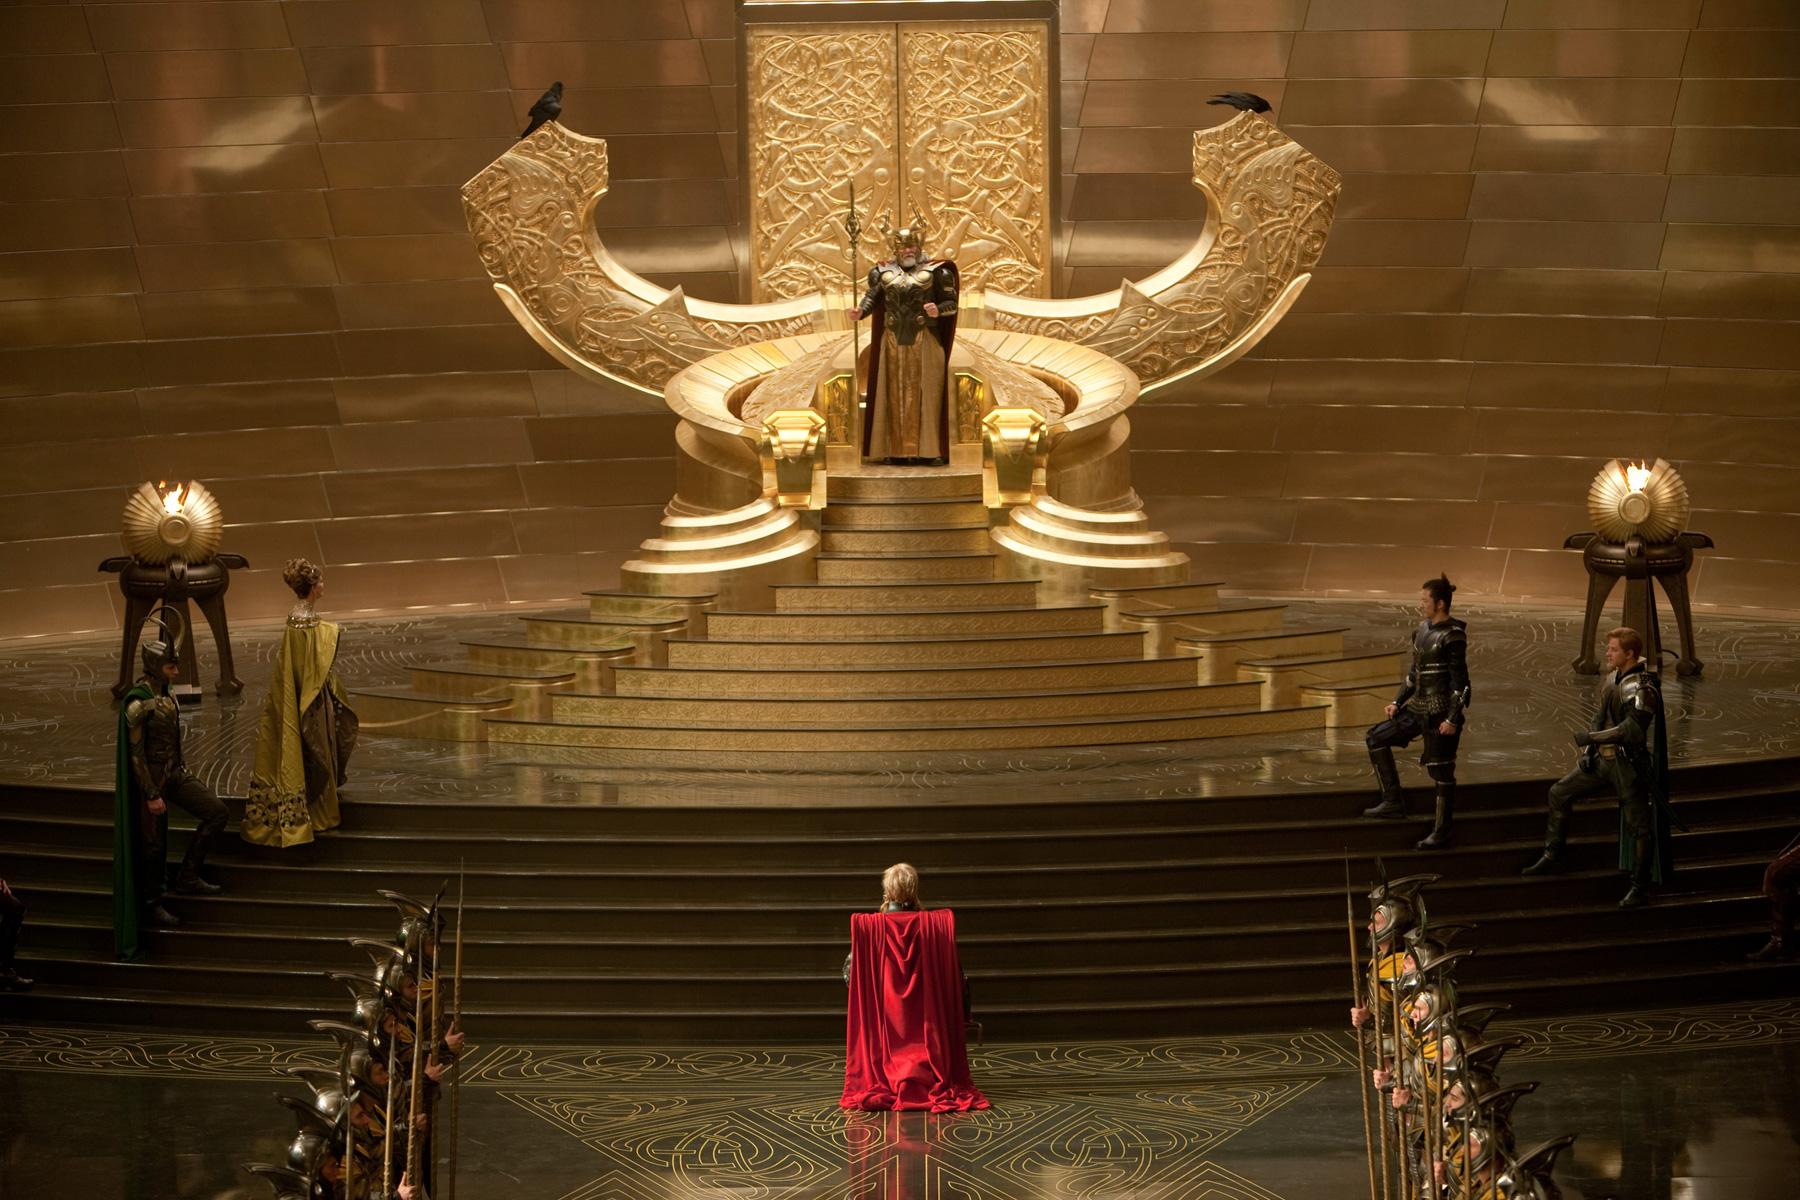 Evil kings throne room - Image Odins Throne Room Asgard Jpg Disney Wiki Fandom Powered By Wikia